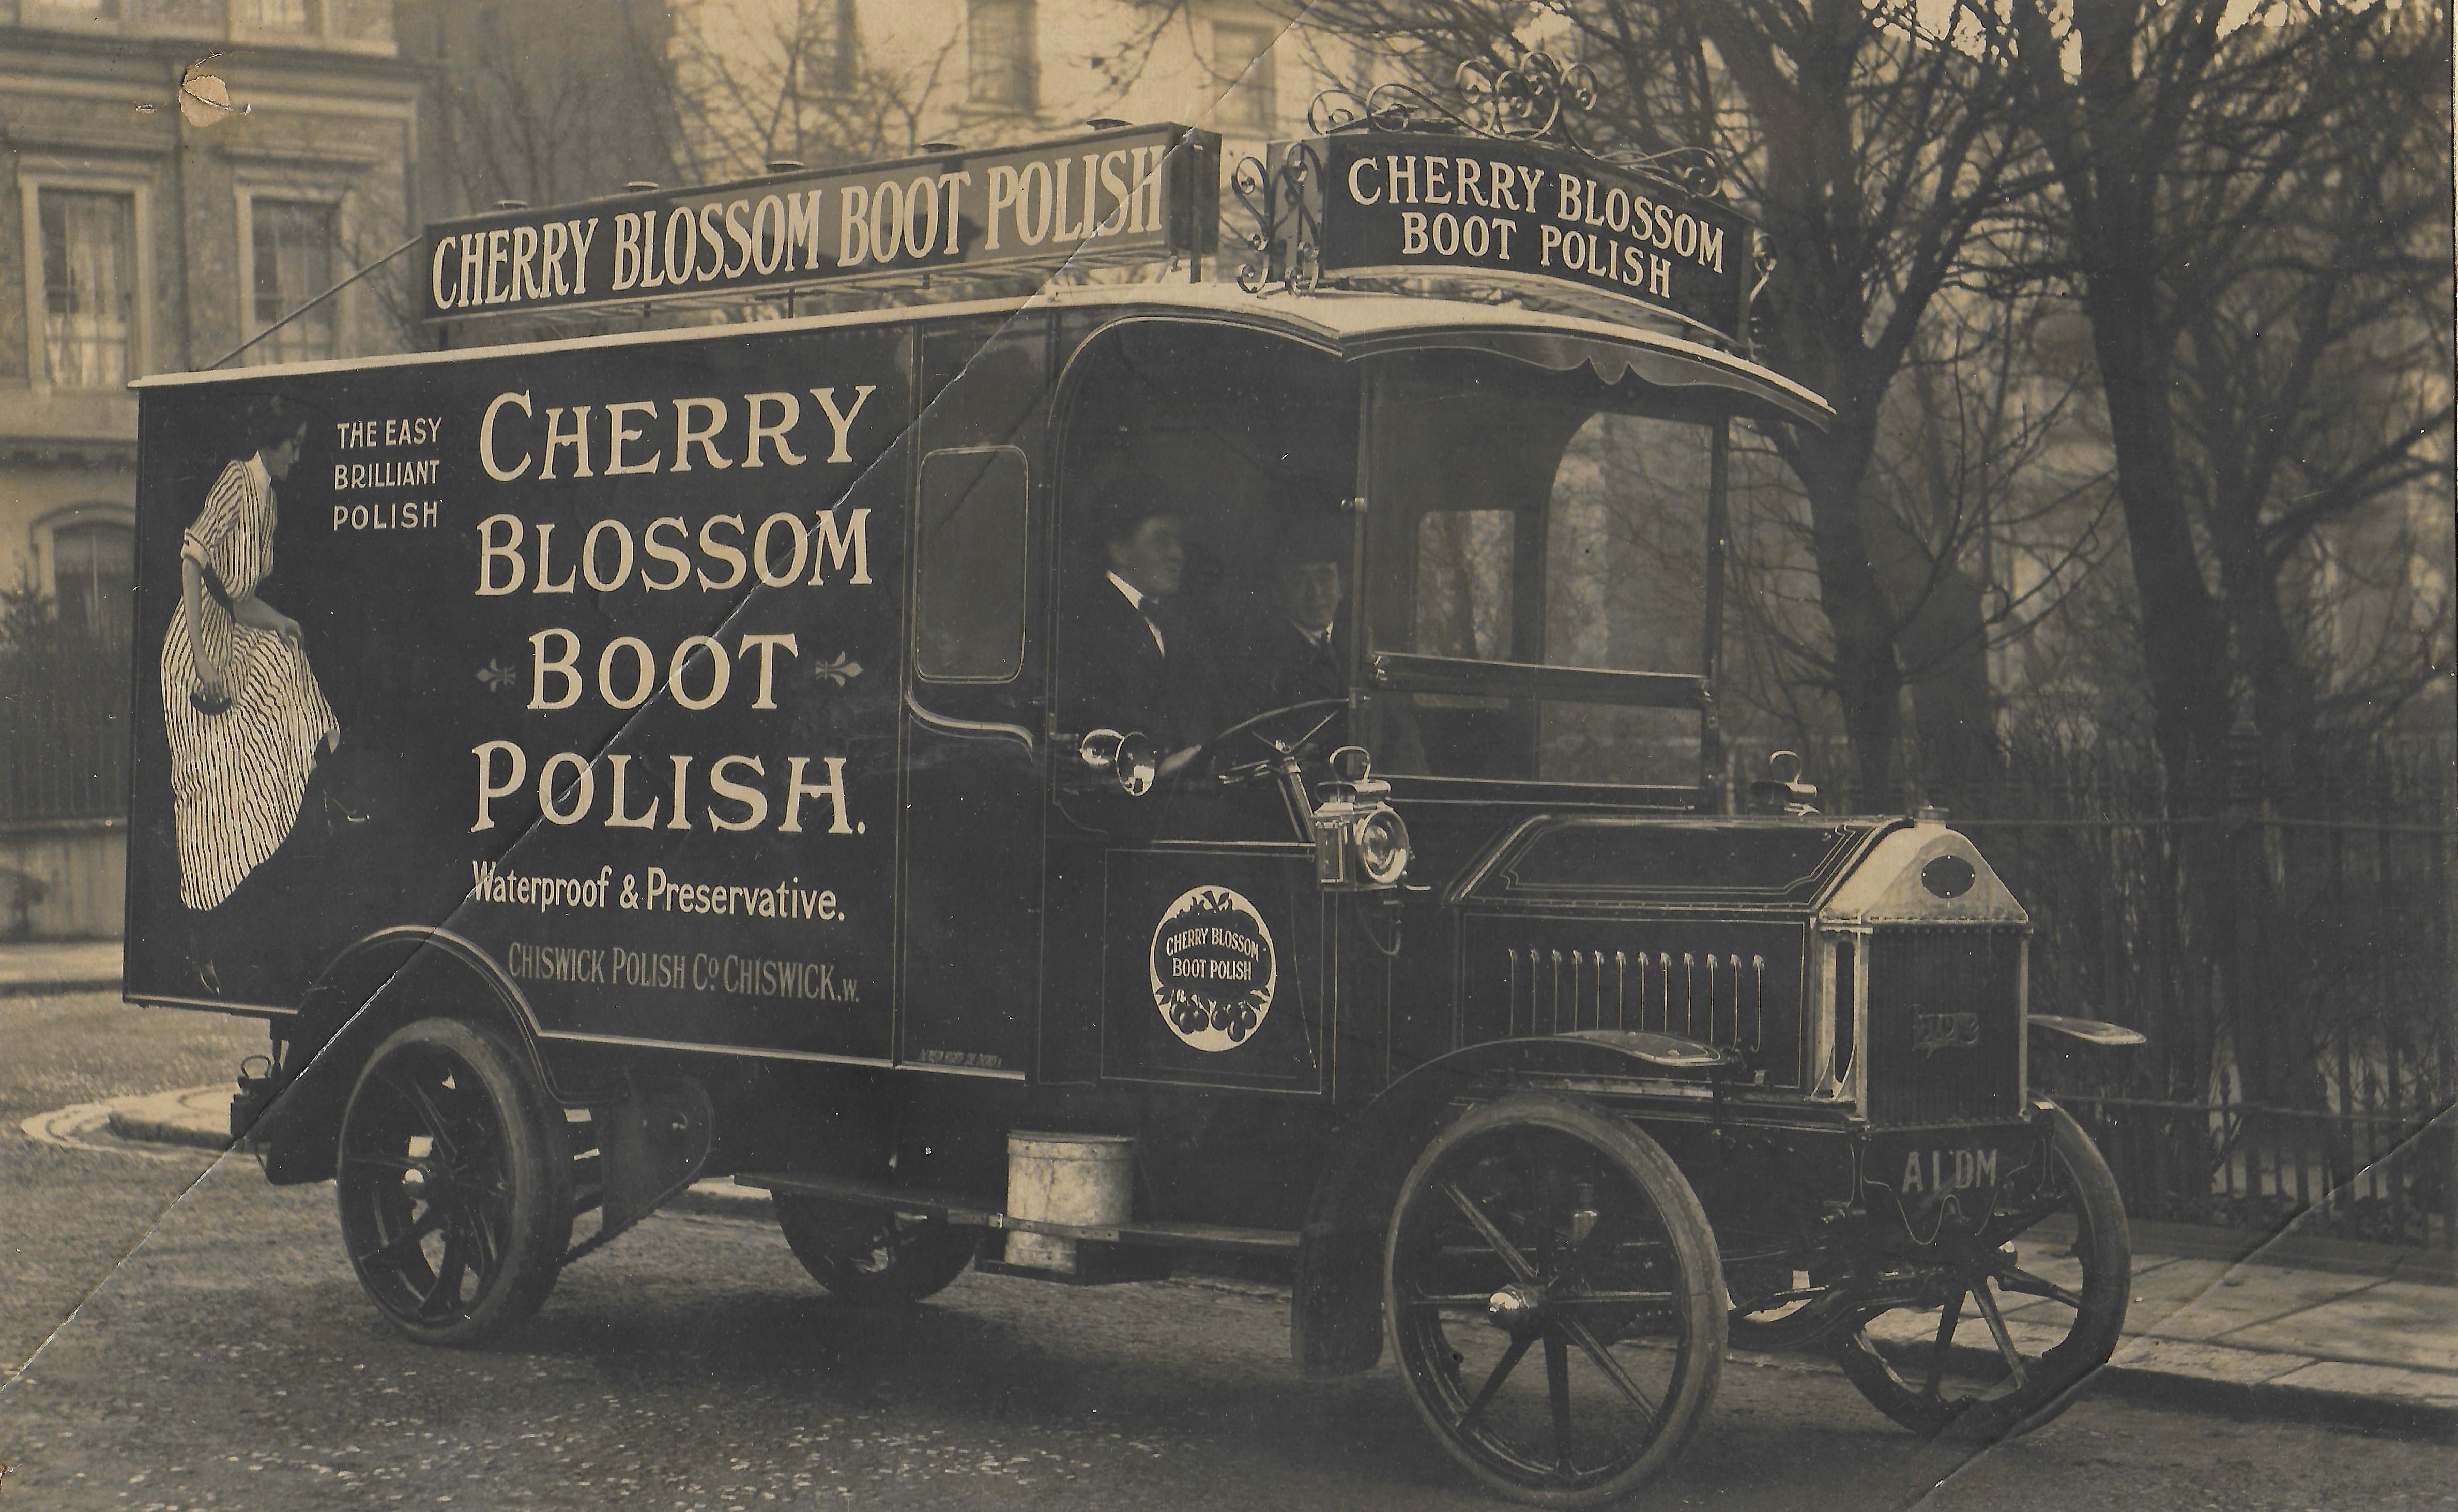 Van For Cherry Blossom Boot Polish